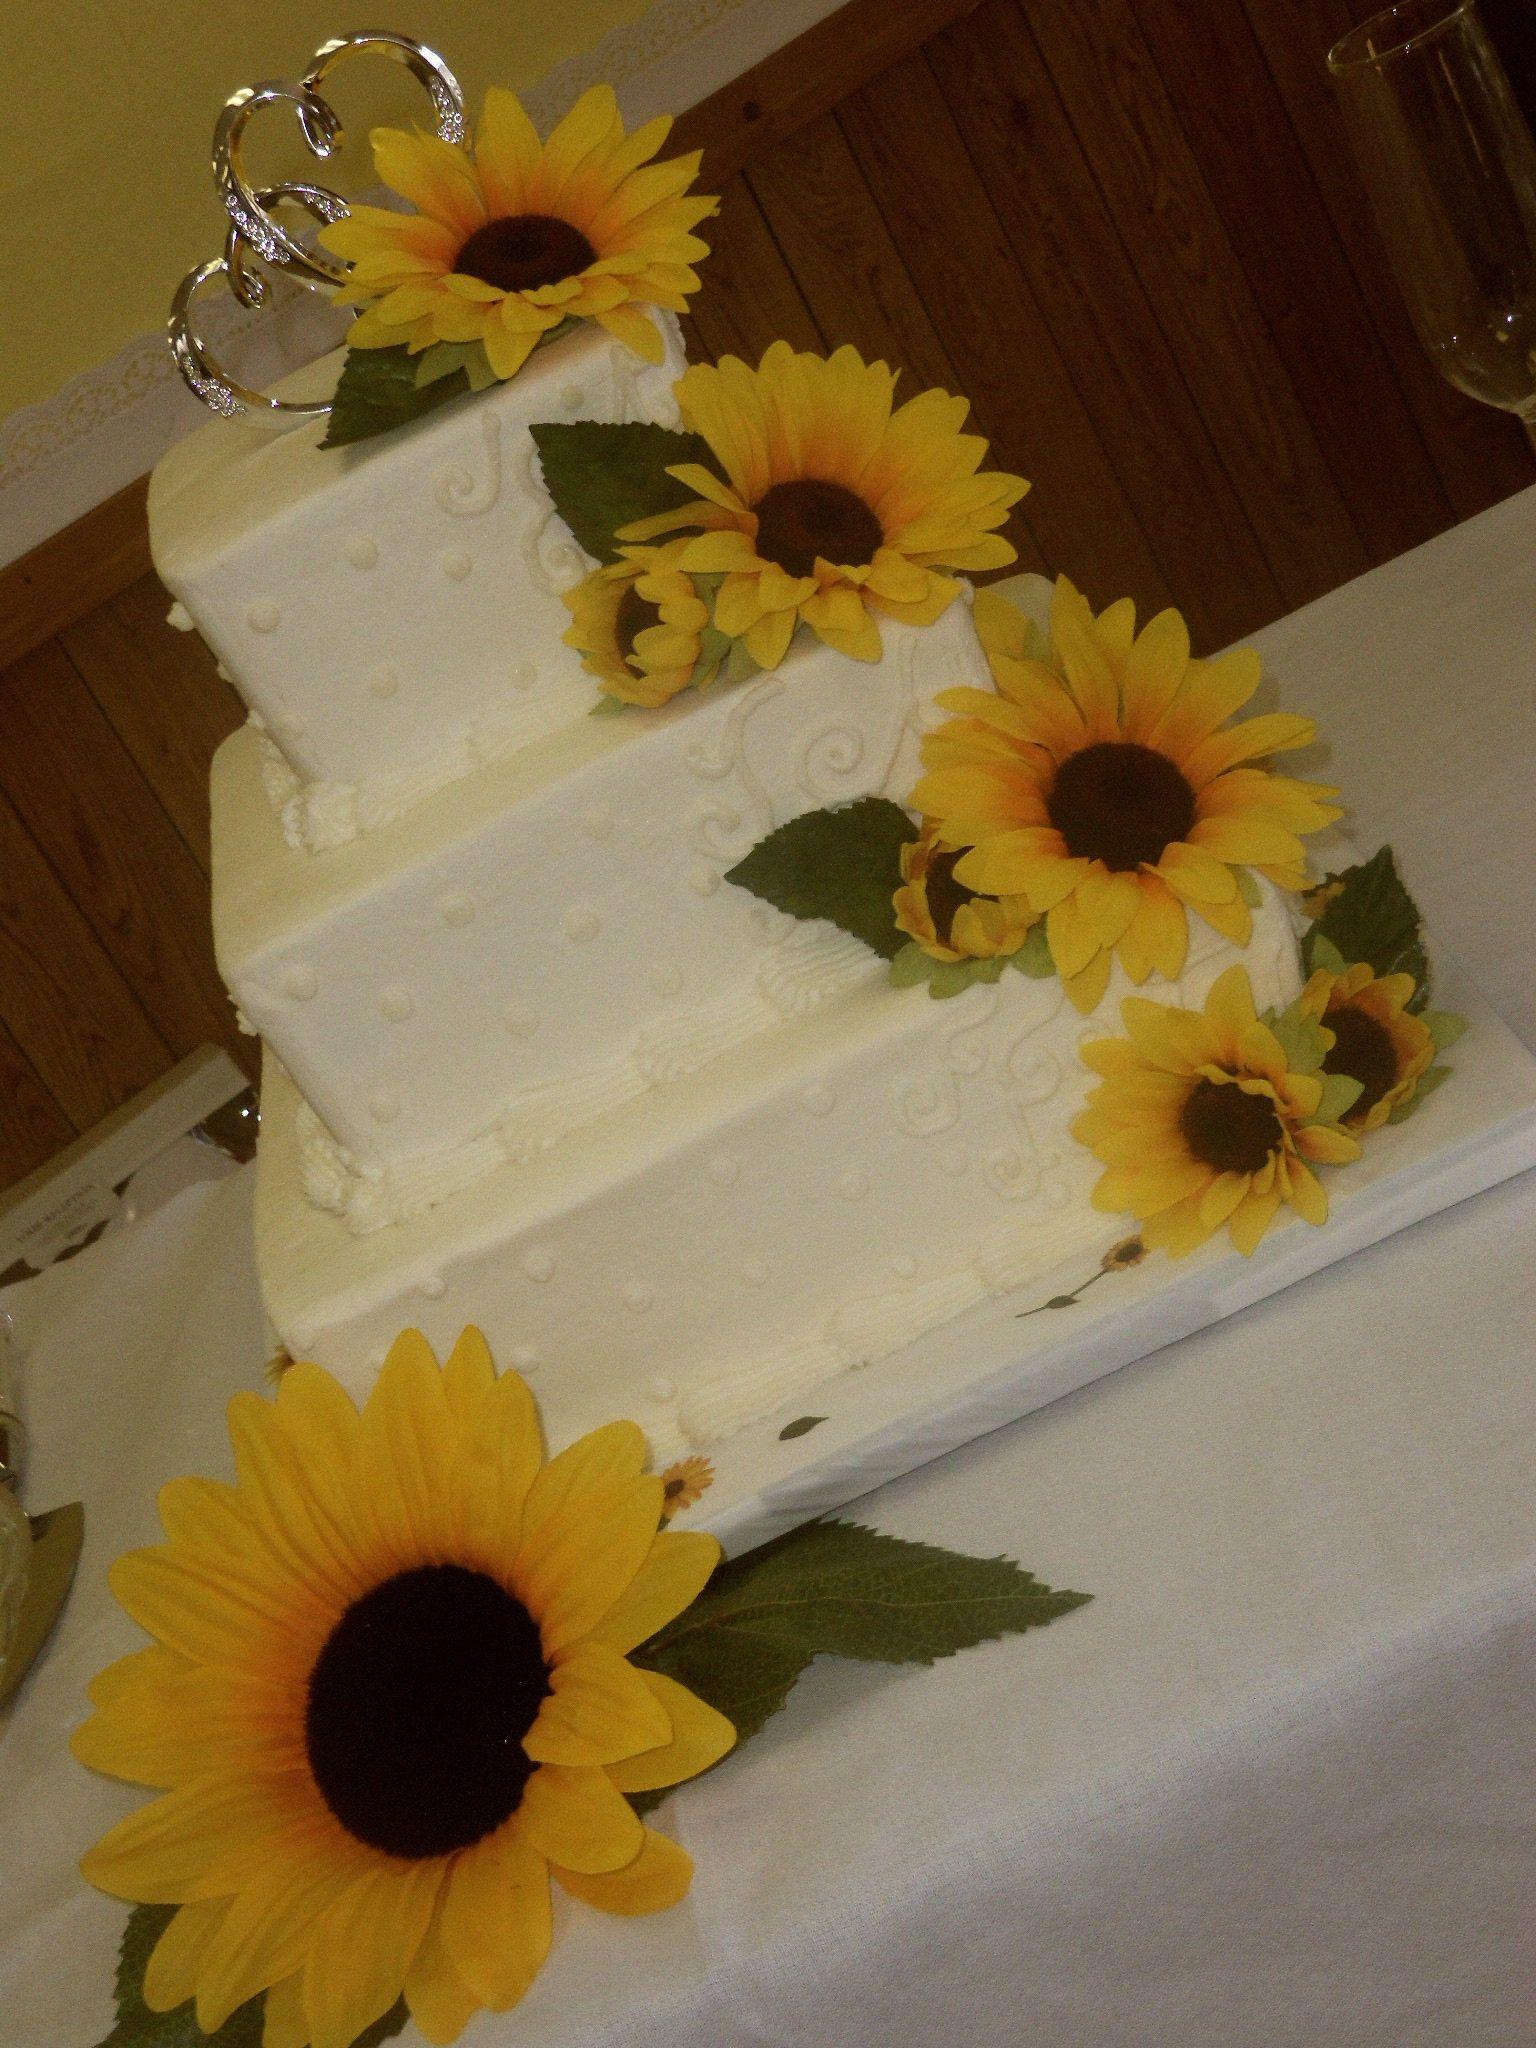 Pin Sunflower Wedding Cake Cake on Pinterest